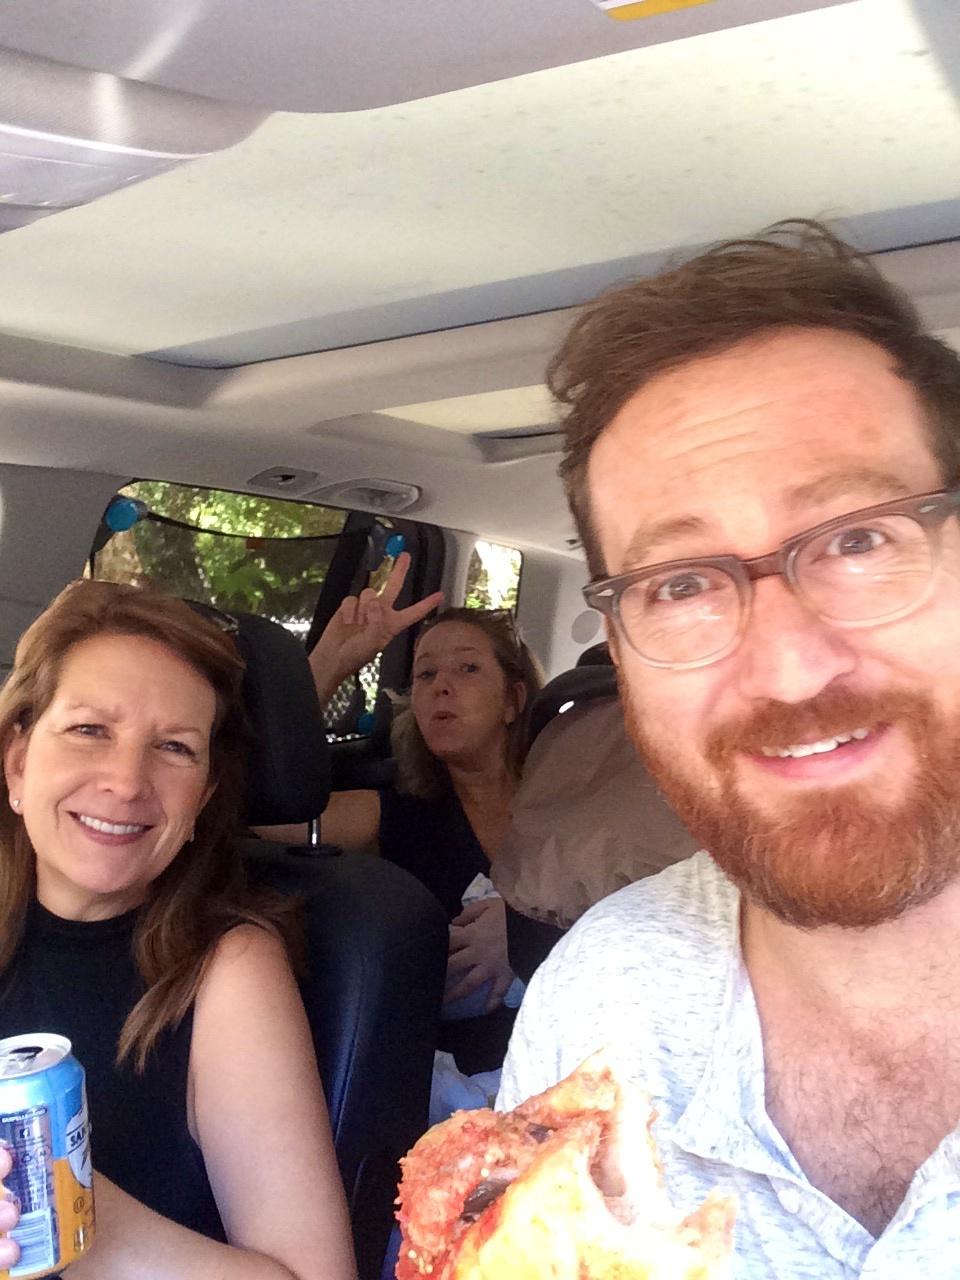 Picnic in the car